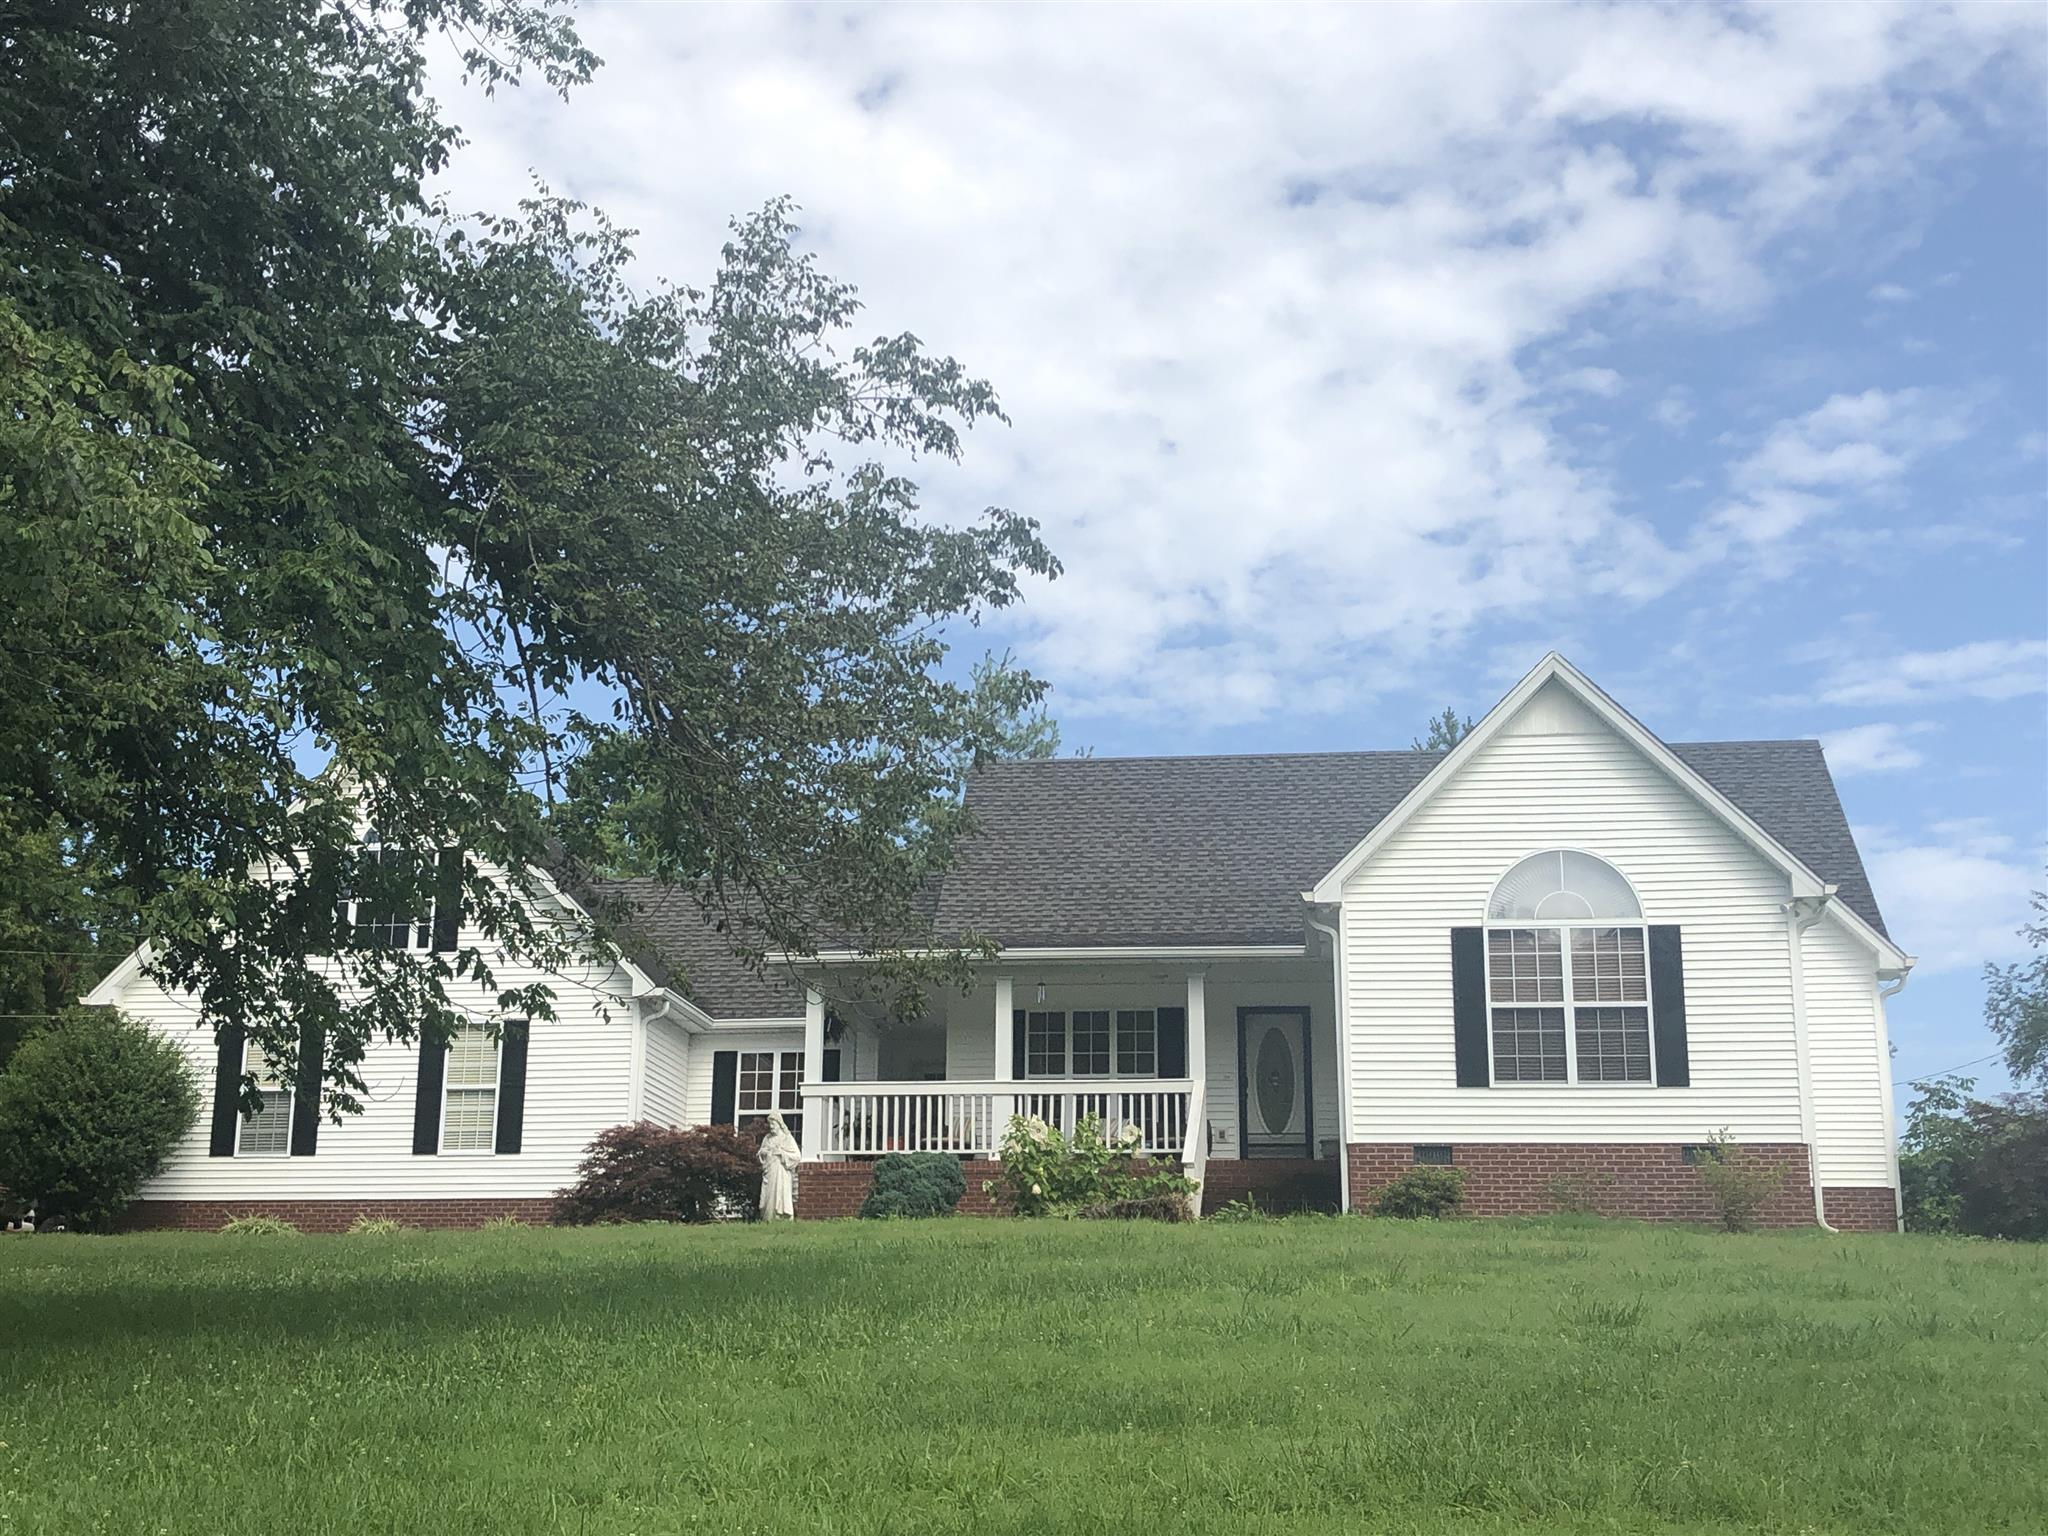 122 East Boiling Springs Rd, Portland, TN 37148 - Portland, TN real estate listing